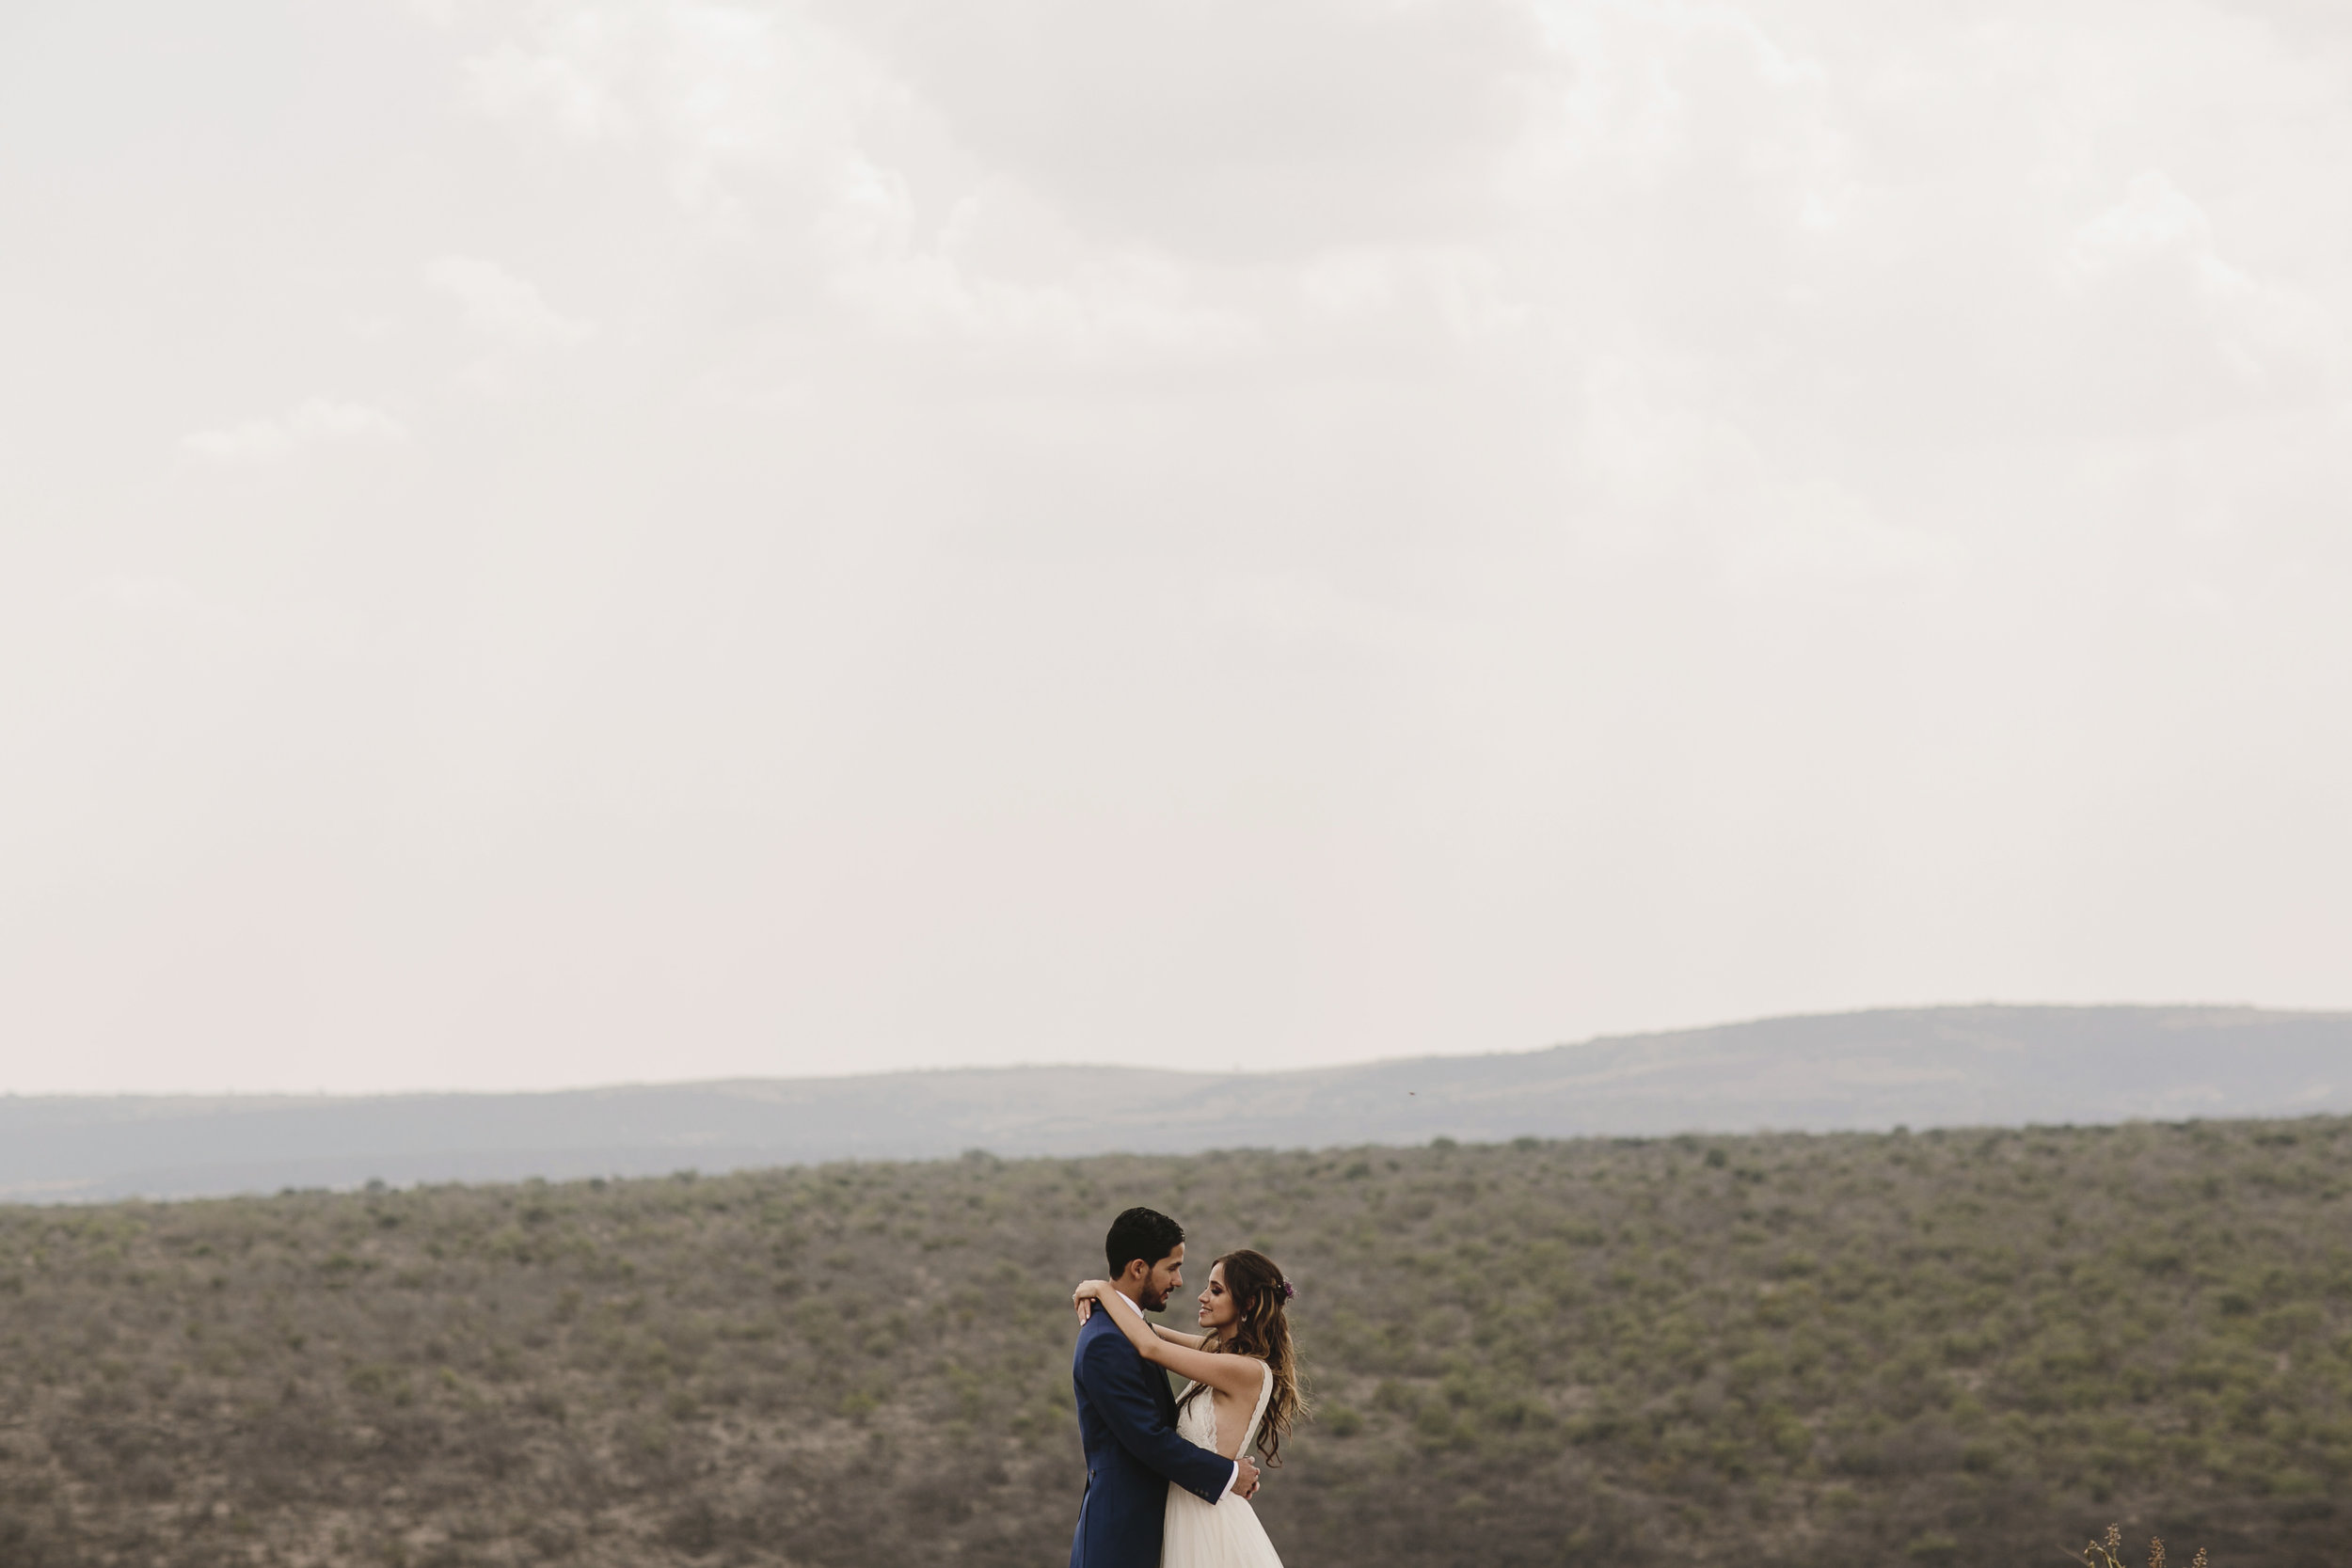 alfons_flores_destination_wedding_photography_mavi_david-1316.JPG